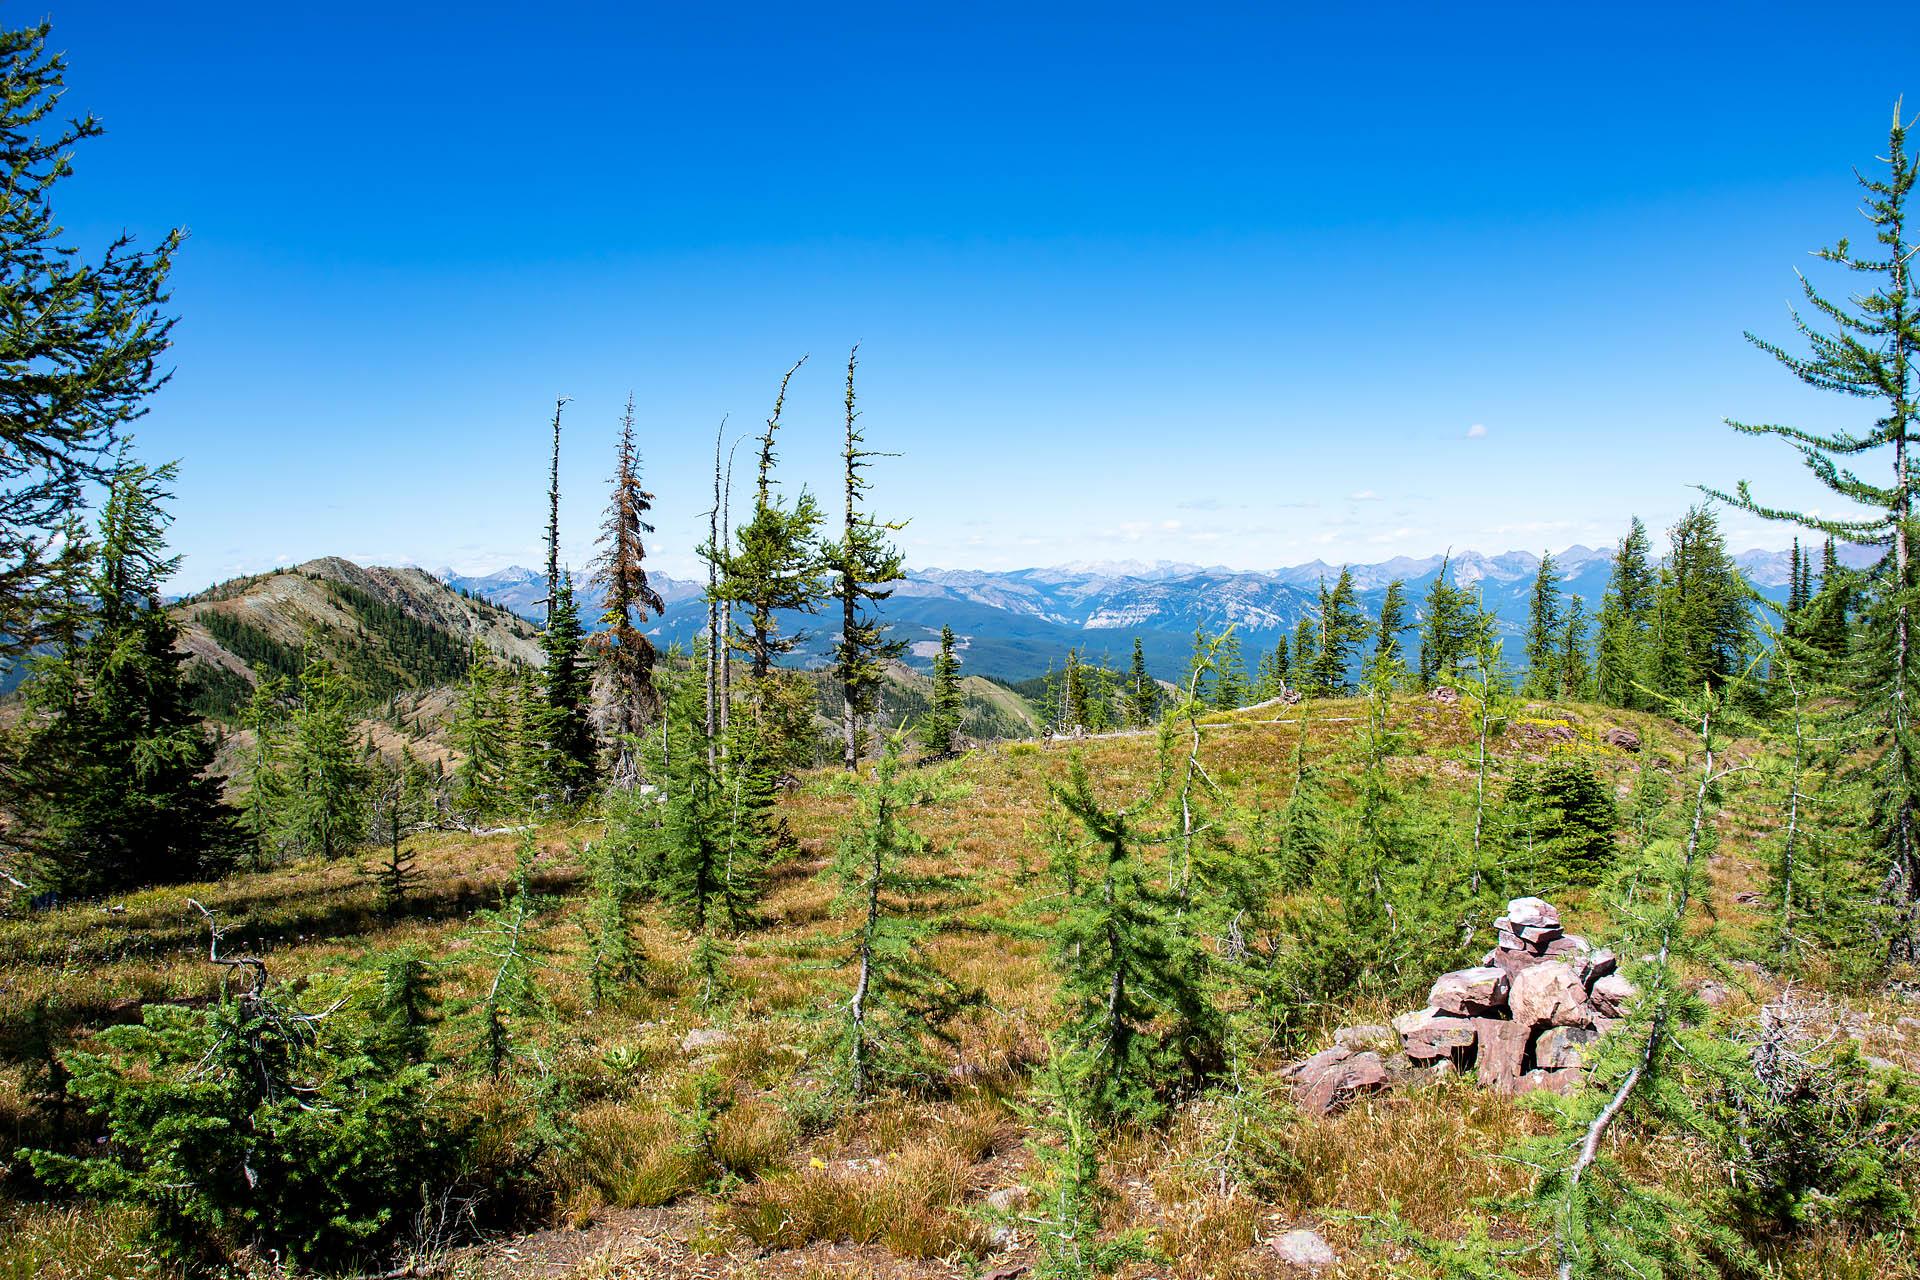 Last cairn & Mt. Hefty (summit to left)